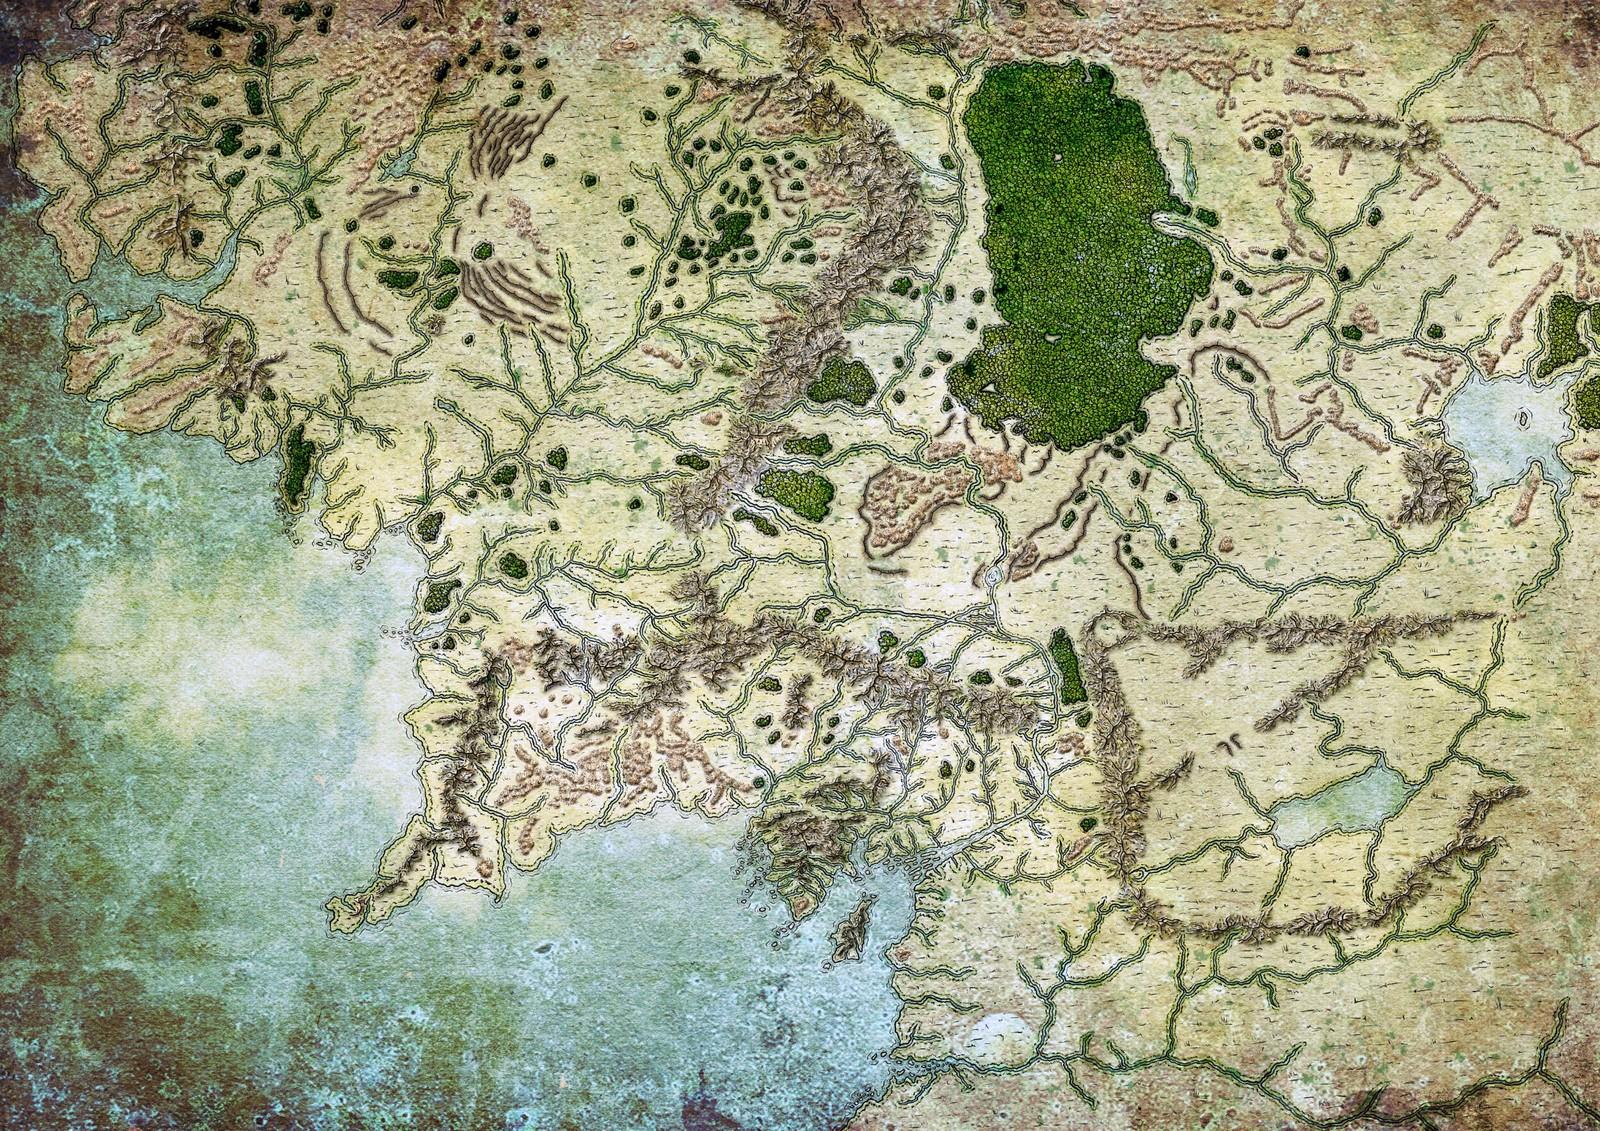 A fan map of middle earth of Tolkien